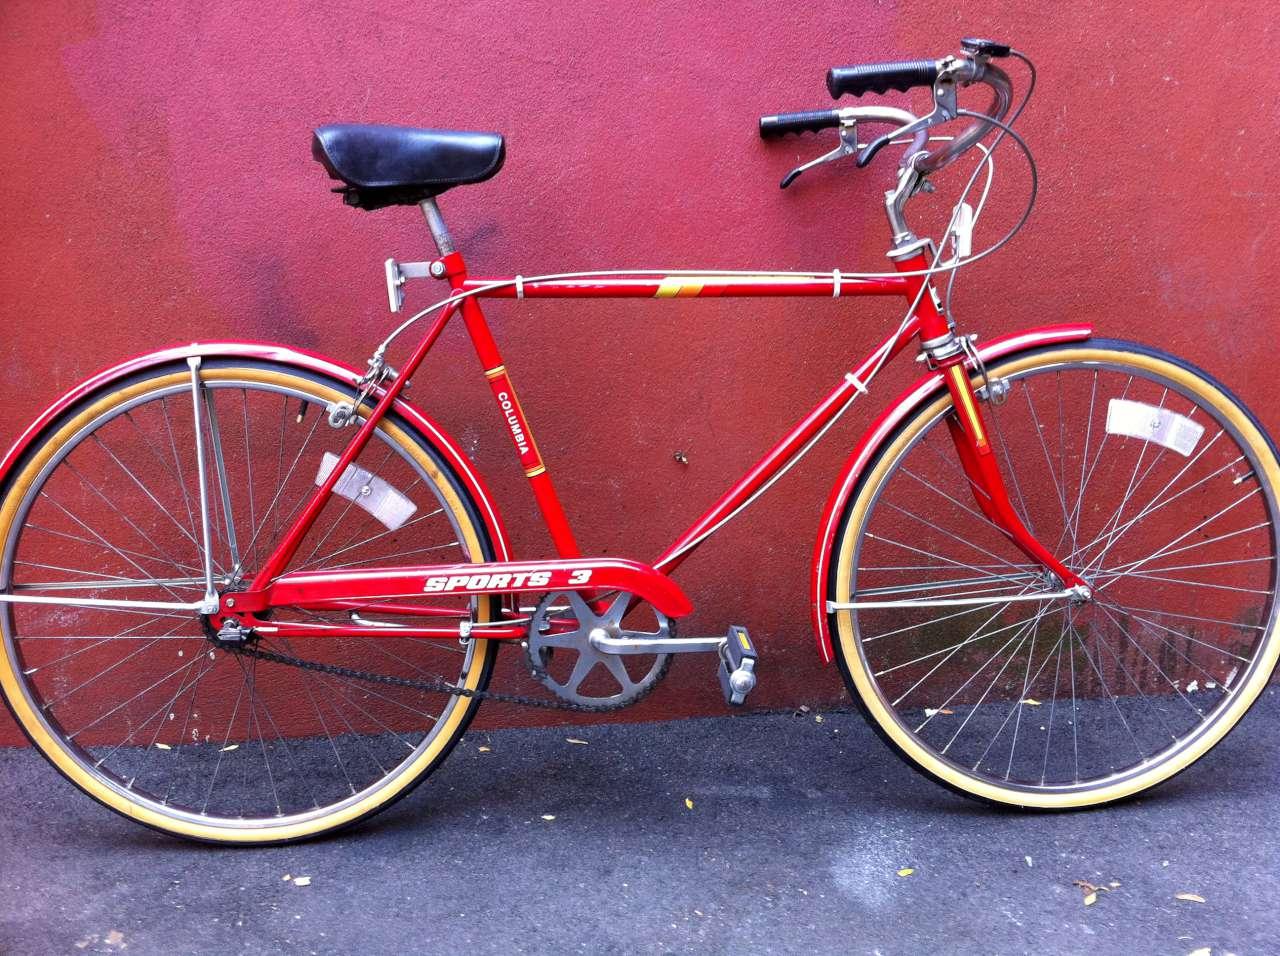 Bike Boom Refurbished Bikes: Early 80's Columbia Sports 3